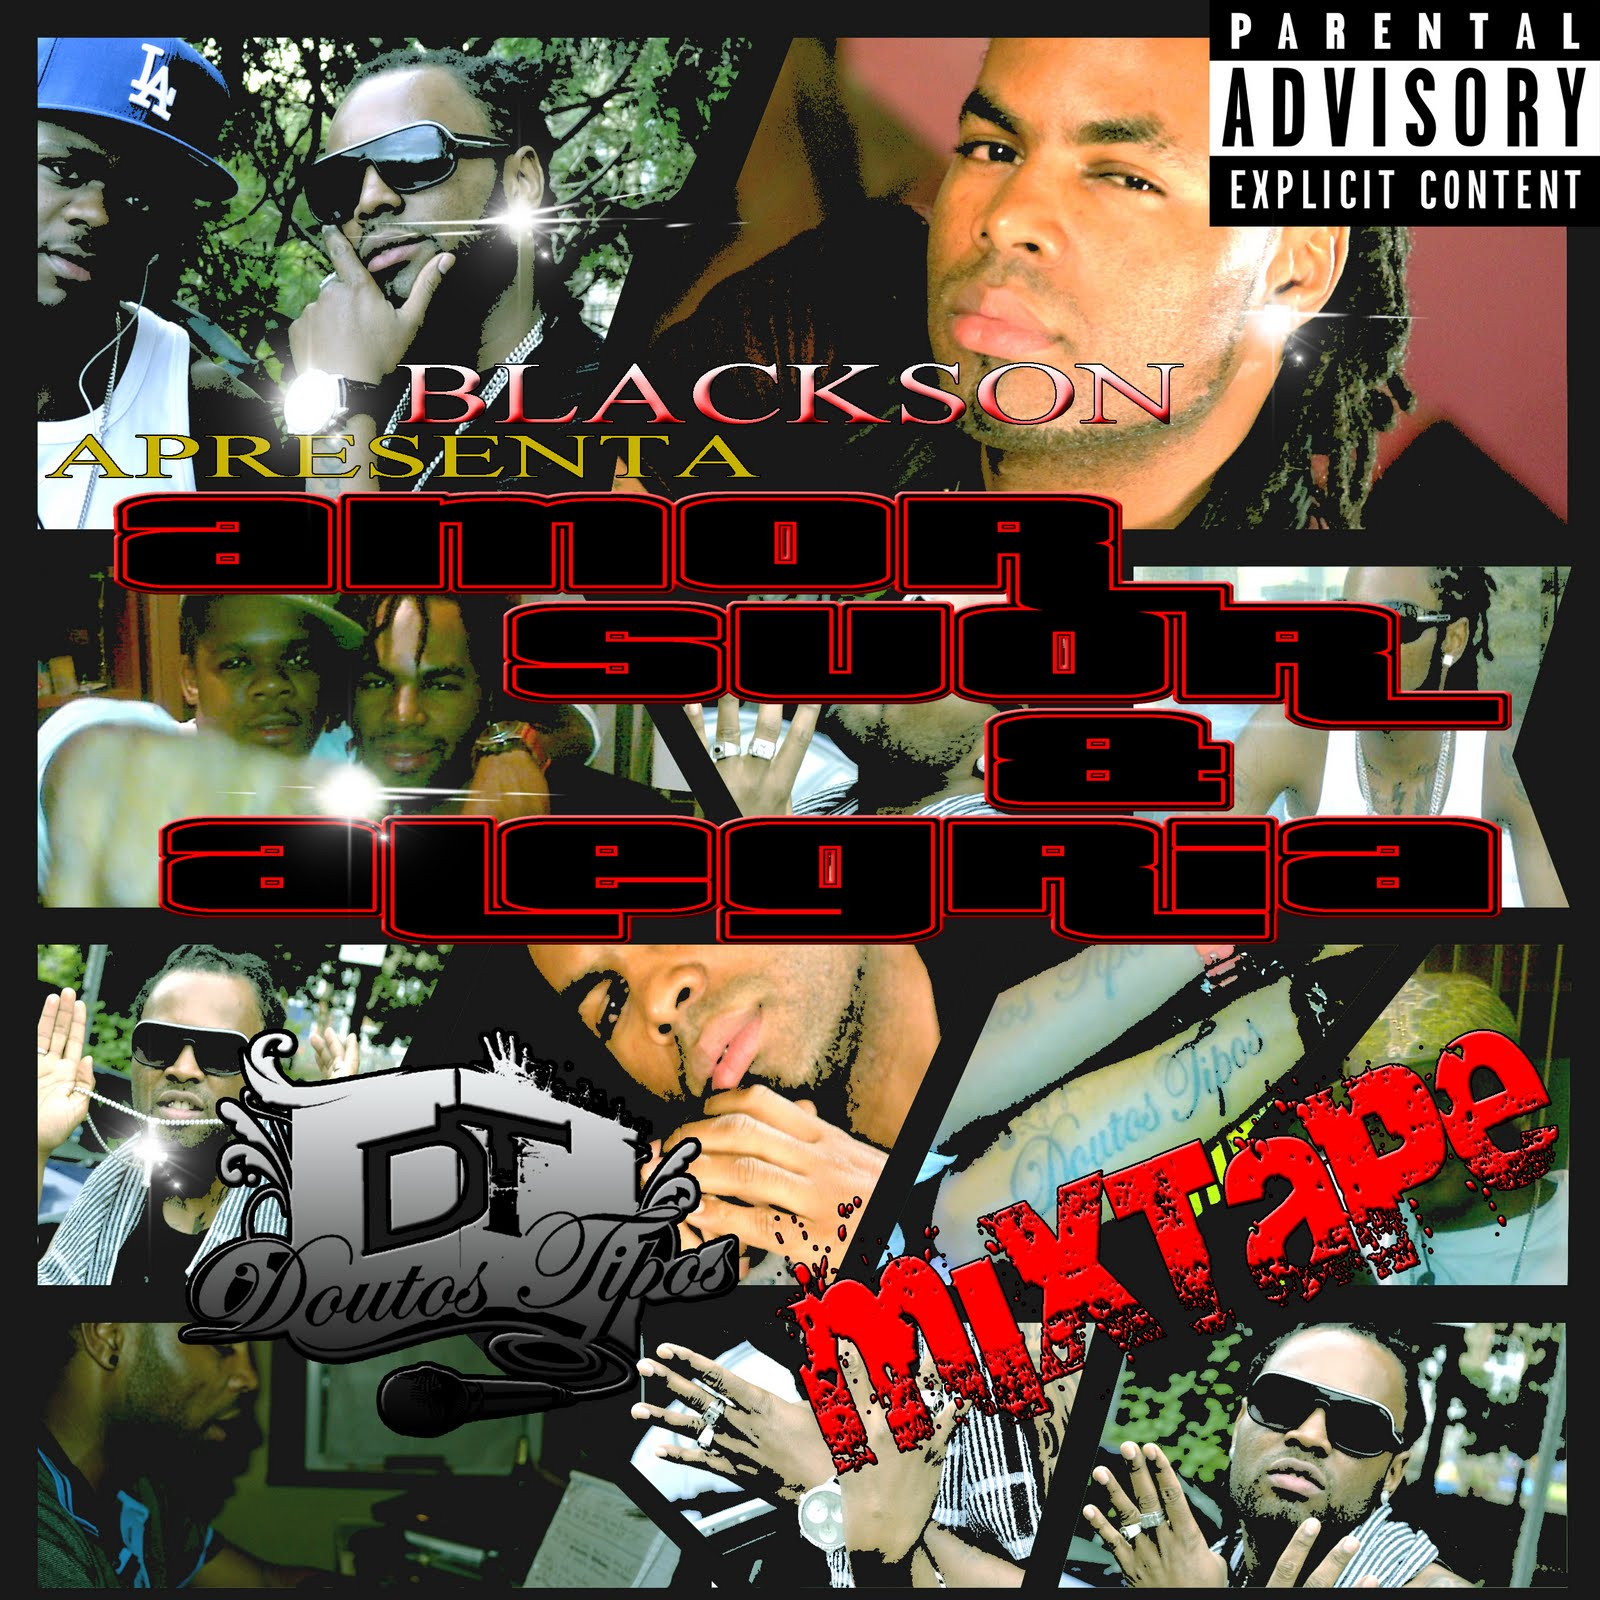 http://2.bp.blogspot.com/-OQN4iSTGw6E/Tm_yBq2mVVI/AAAAAAAAGcA/eNZVbqPZFtg/s1600/blacksunfront.jpg